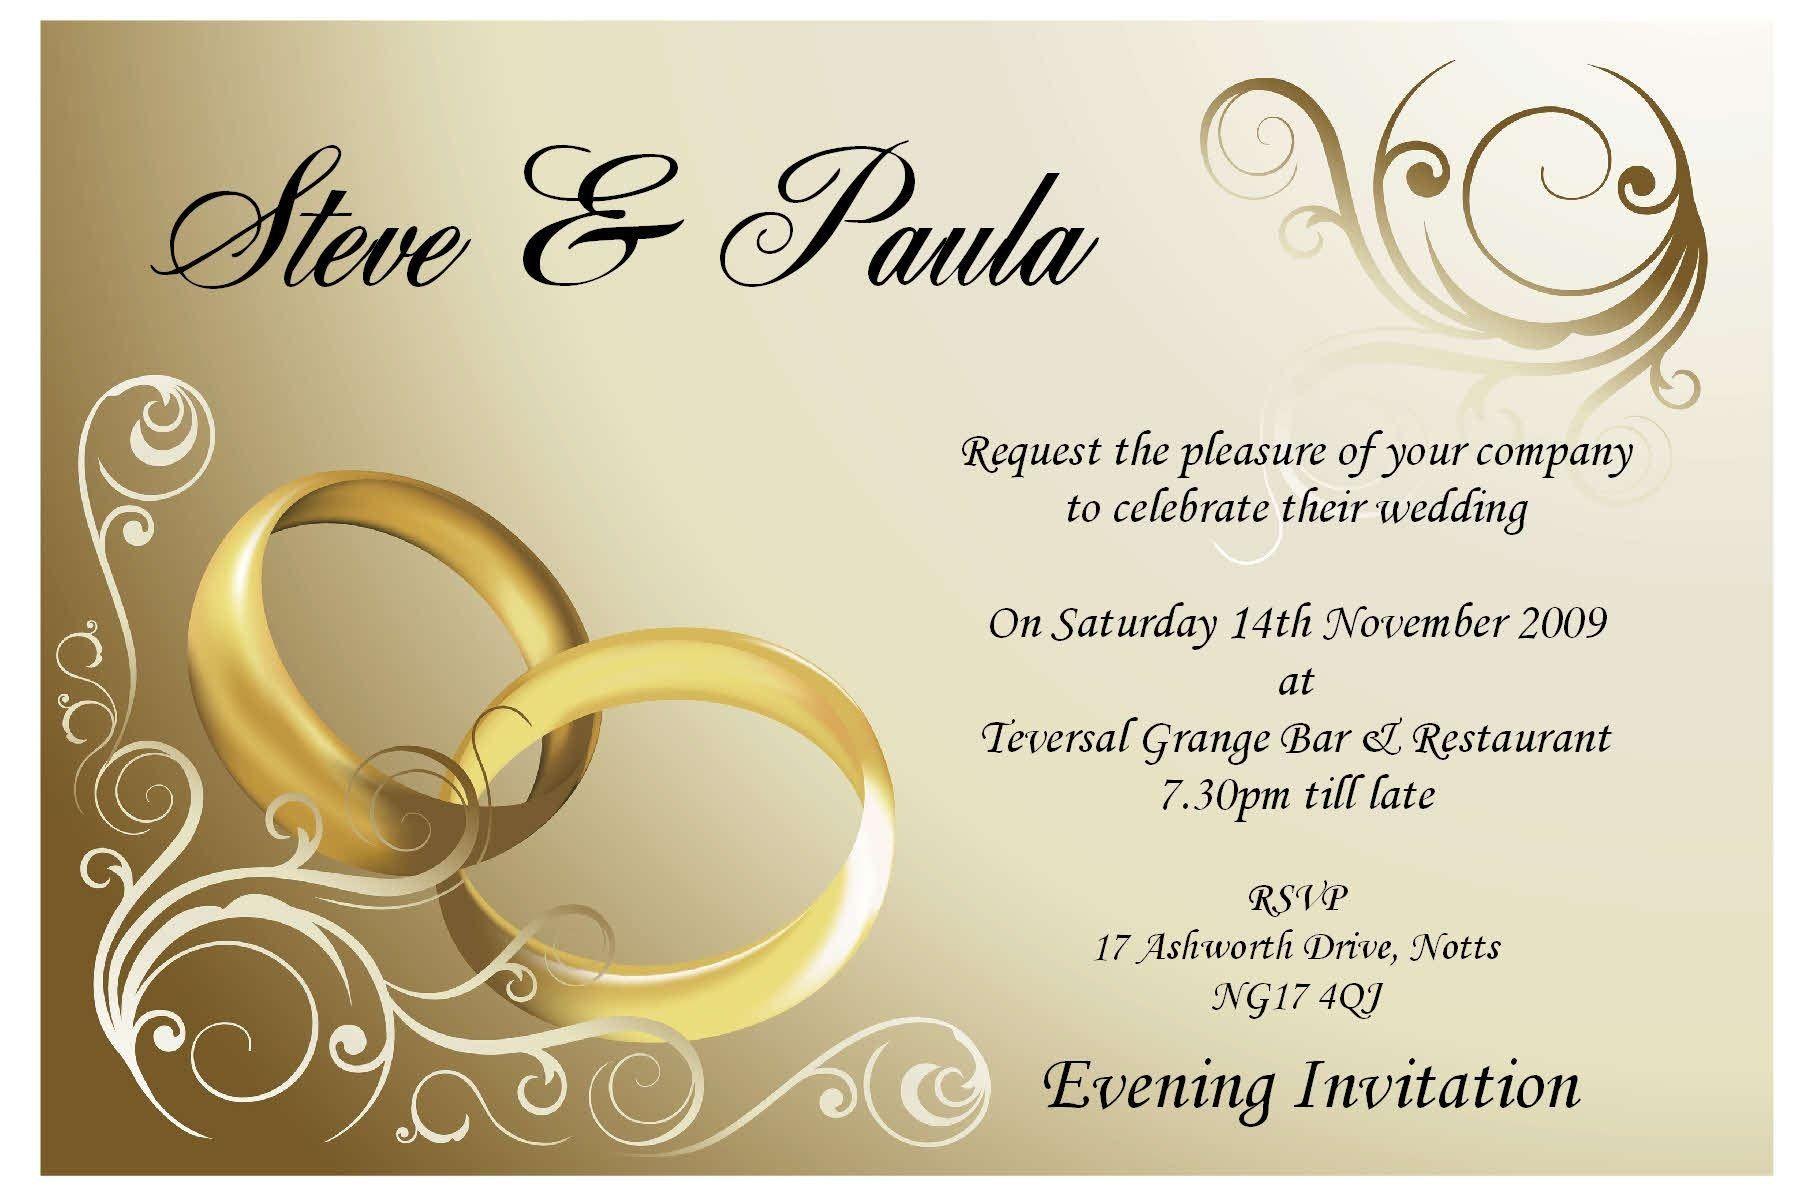 Sample Wedding Invitation Cards Templates Engagement Invitation Cards Marriage Invitation Card Personalised Wedding Invitations